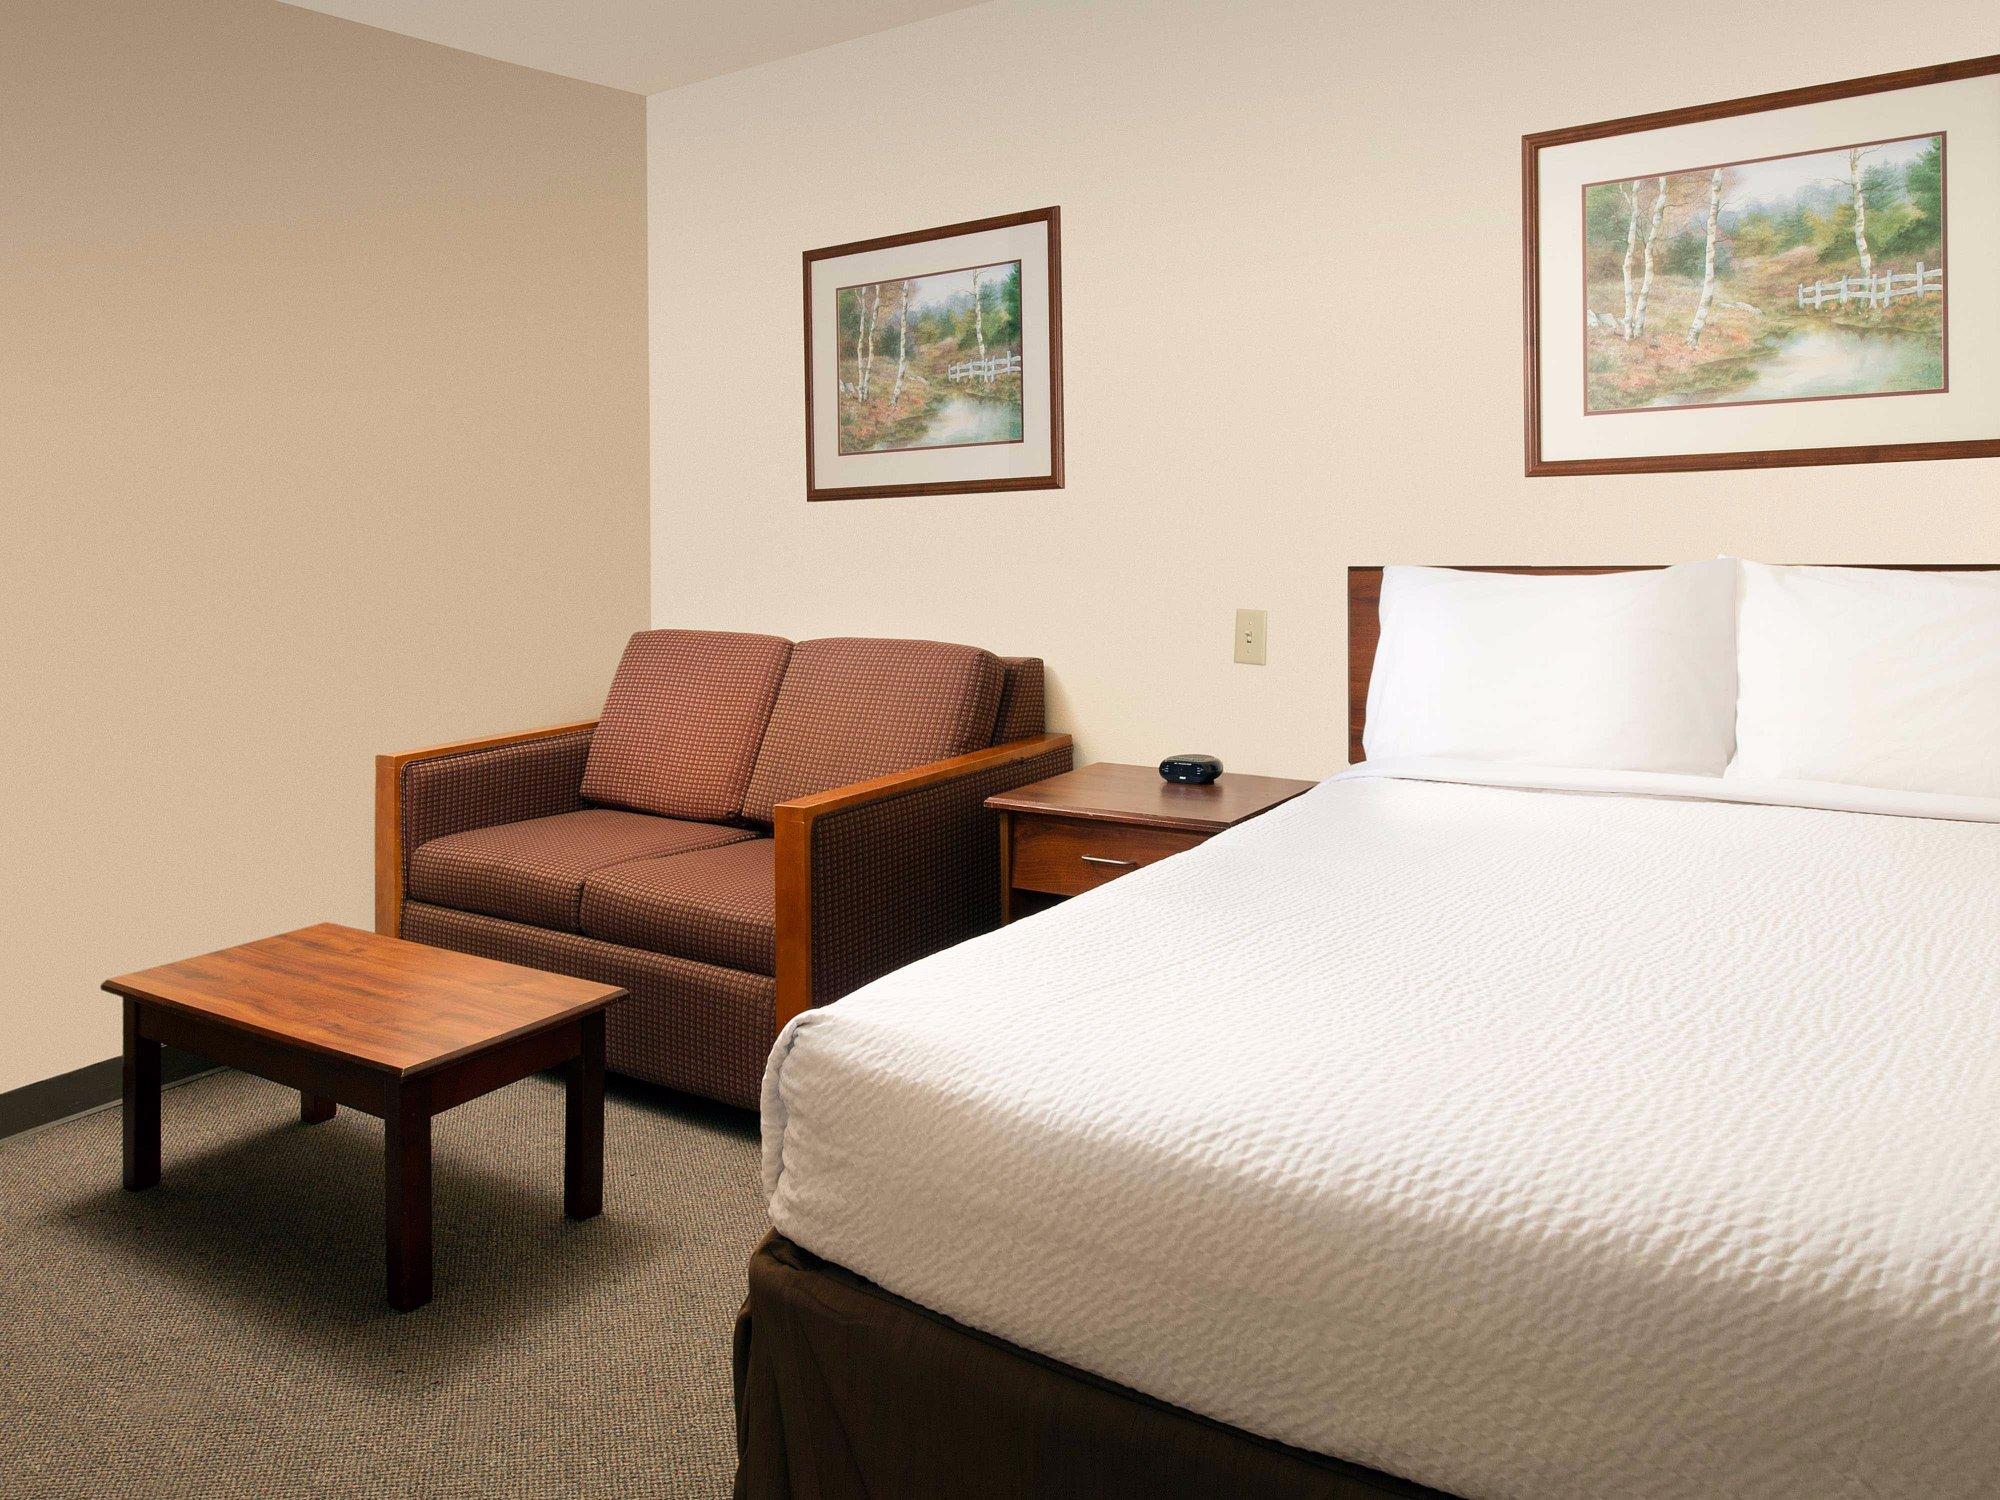 WoodSpring Suites San Antonio I-35 North